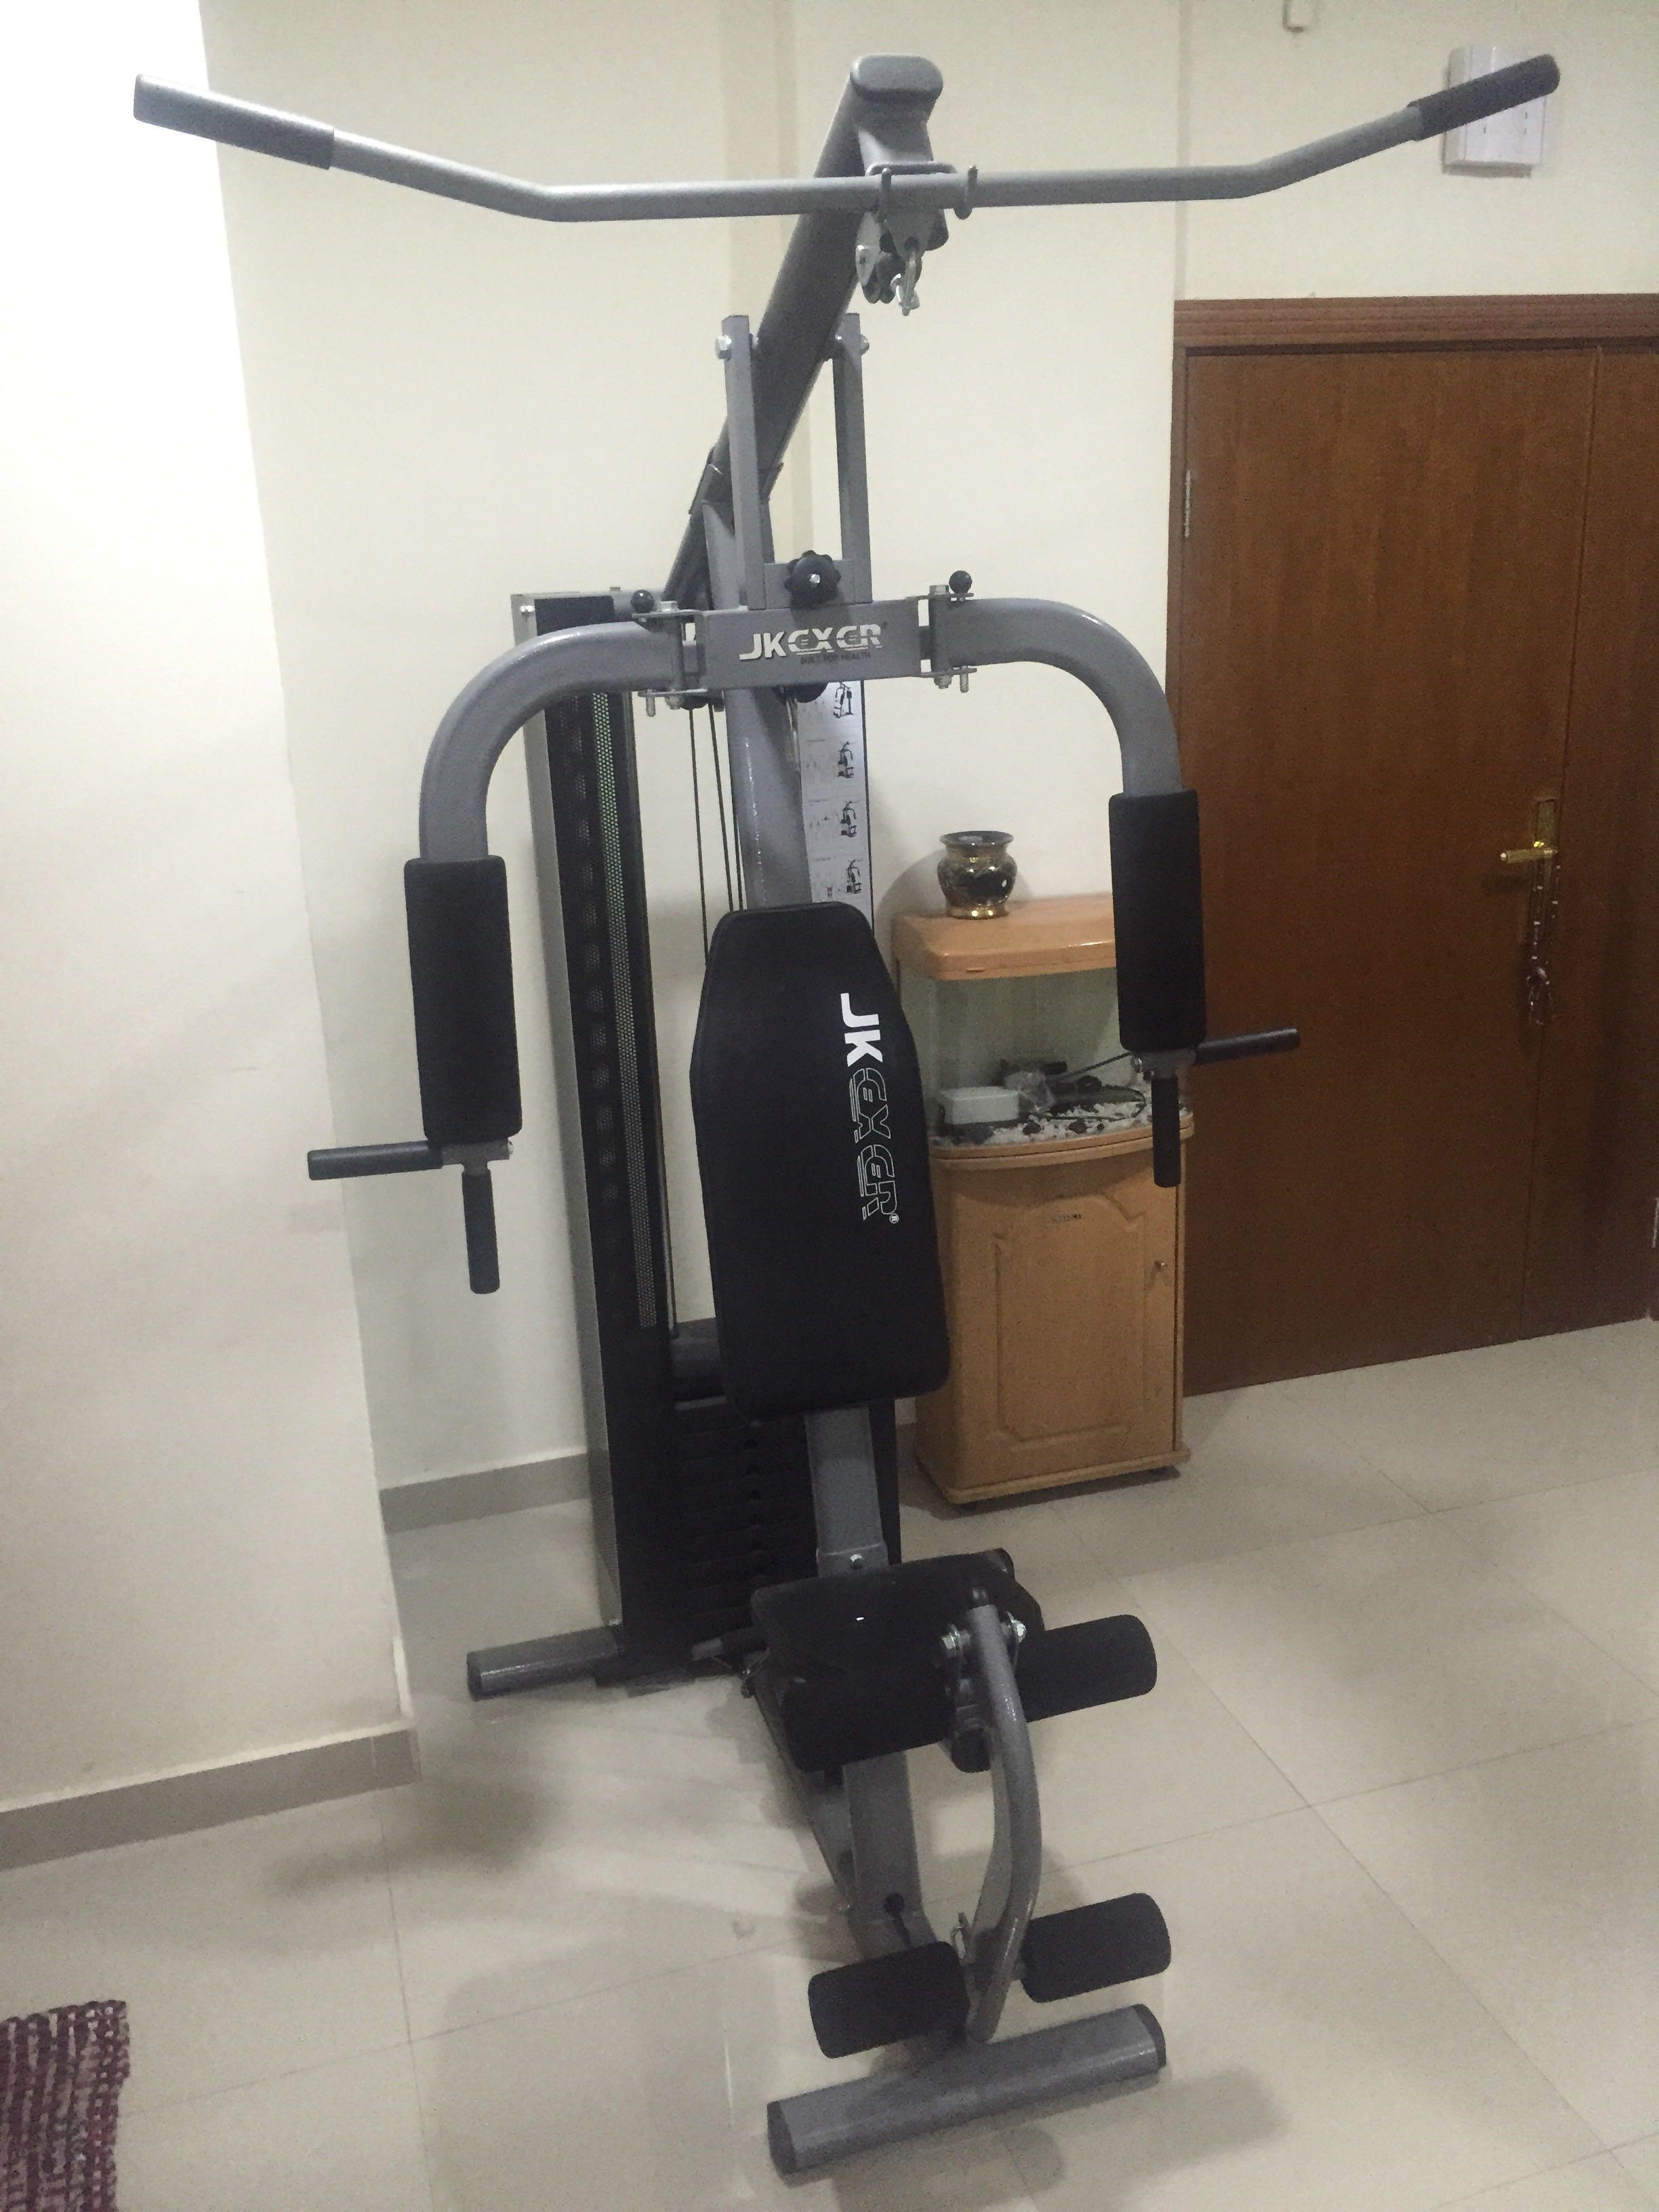 Home gym jkexer cheapest in town qatar living